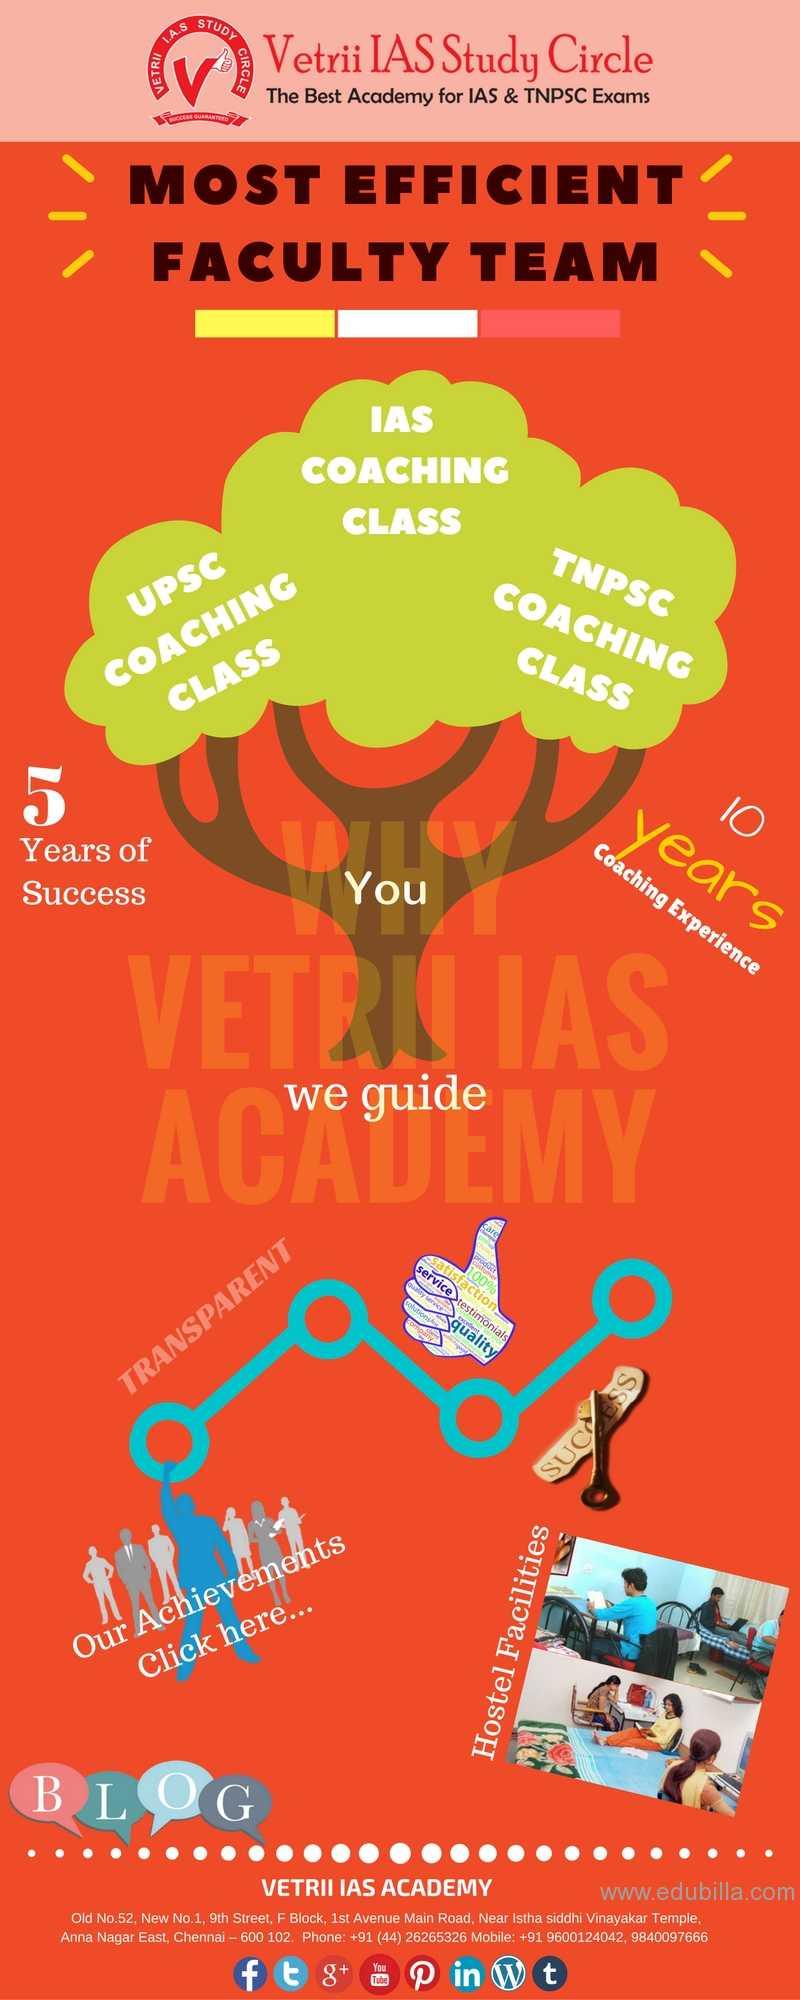 vetrii_ias_academy_upsc-tnpsc-ias-coaching_centre_chennai.jpg